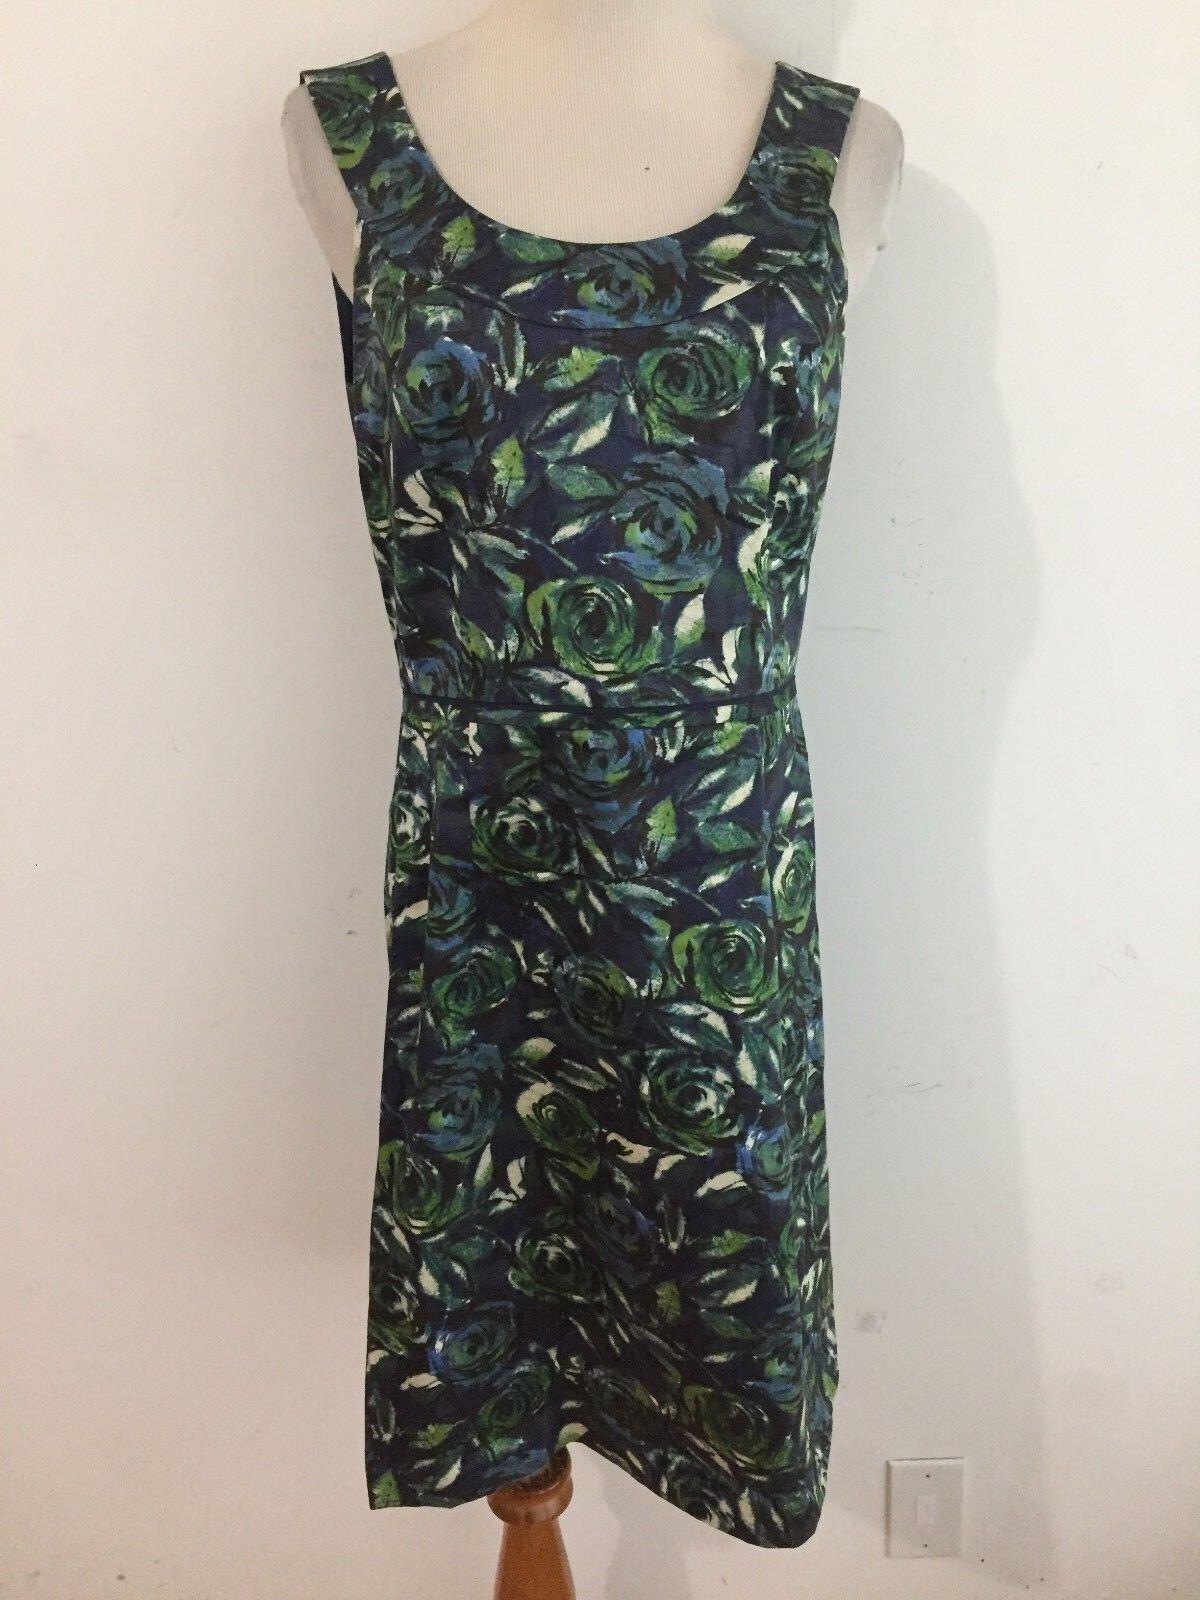 3dbed916ab7c Ann Taylor LOFT Sleeveless Sheath Dress Navy Azure Green Beige Floral Sz 4  NWOT